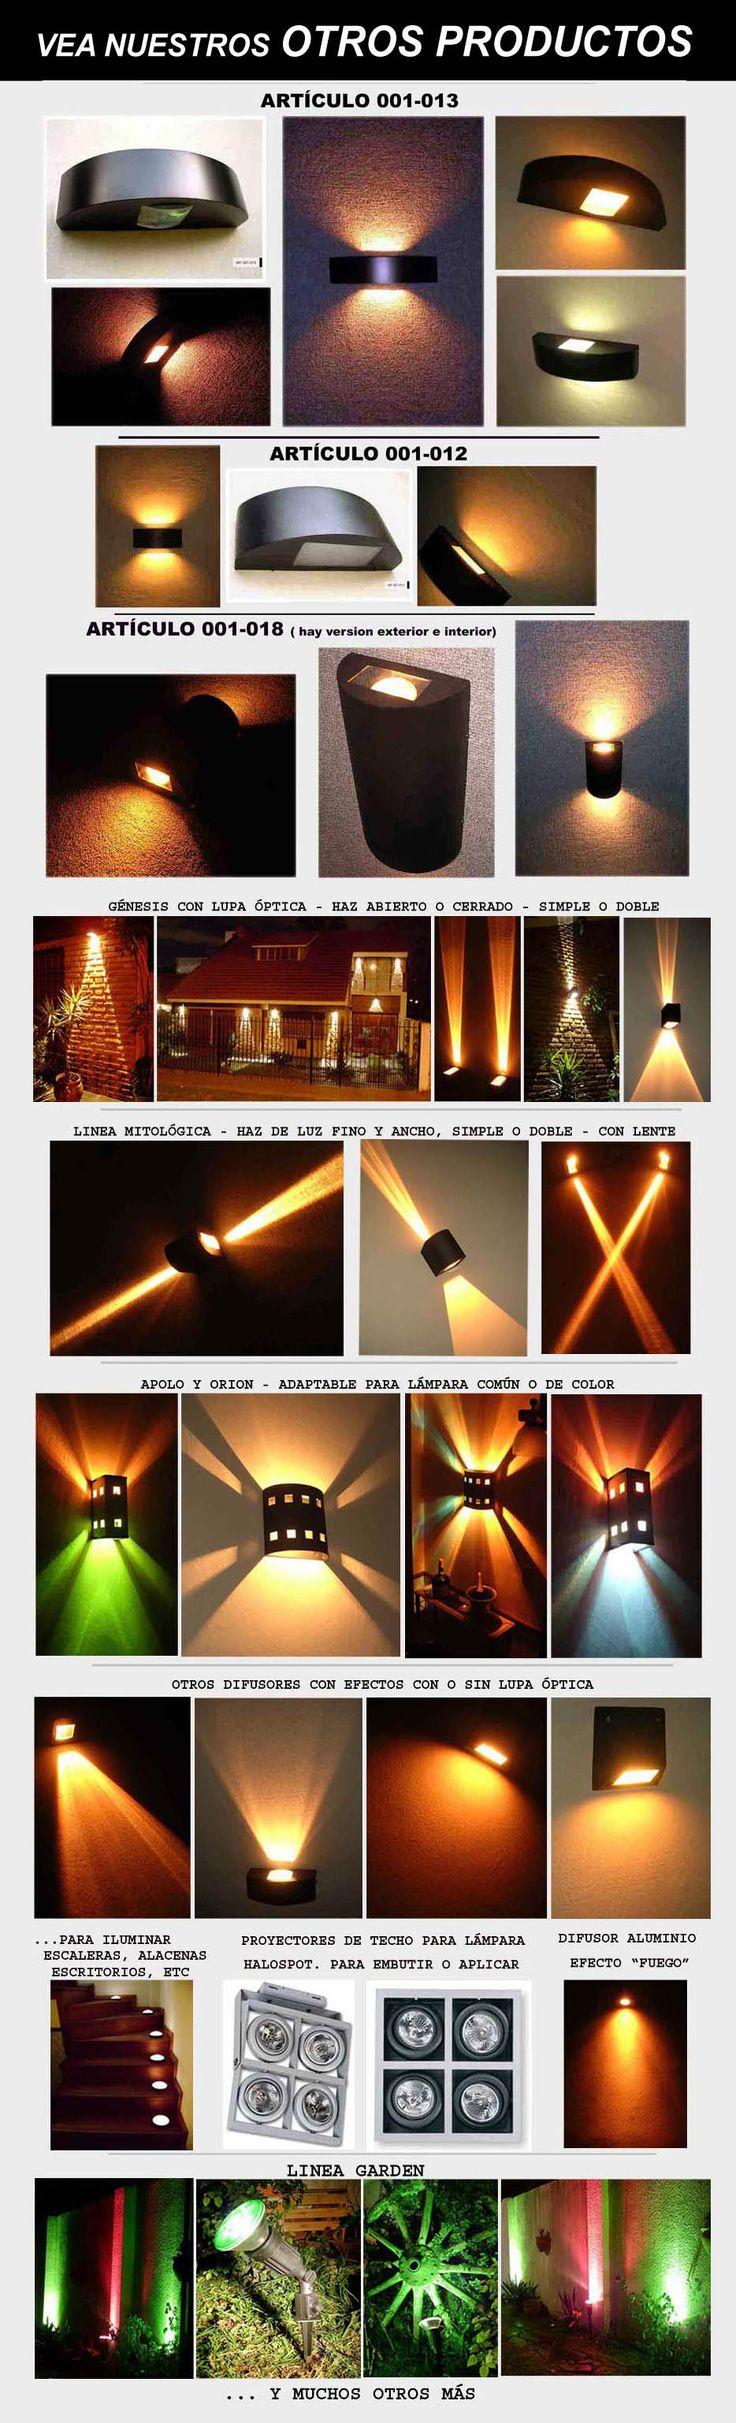 Iluminacion Exterior Para Jardines - Difusor Con Lupa Optica - $ 595,00 en Mercado Libre